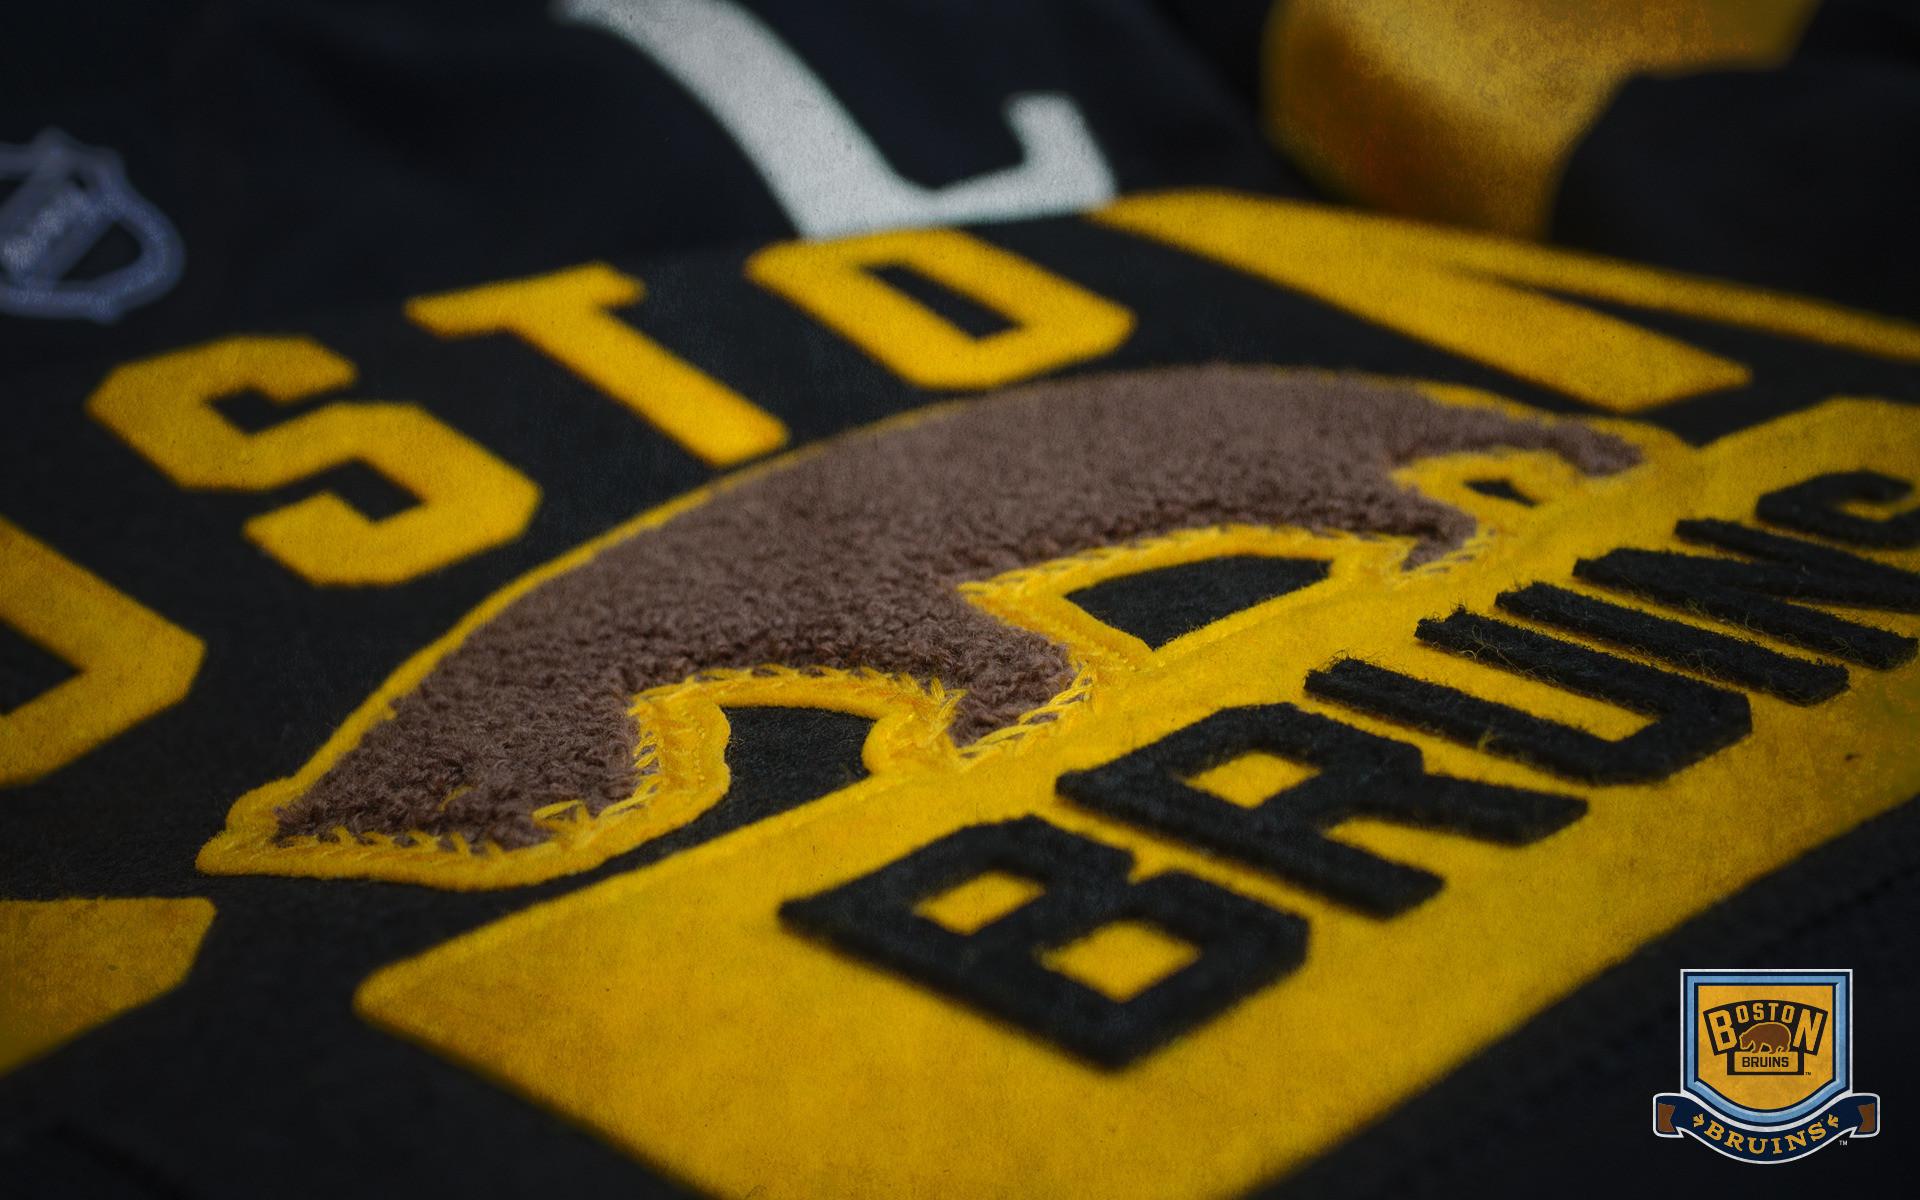 Boston Bruins Photo Download Free.